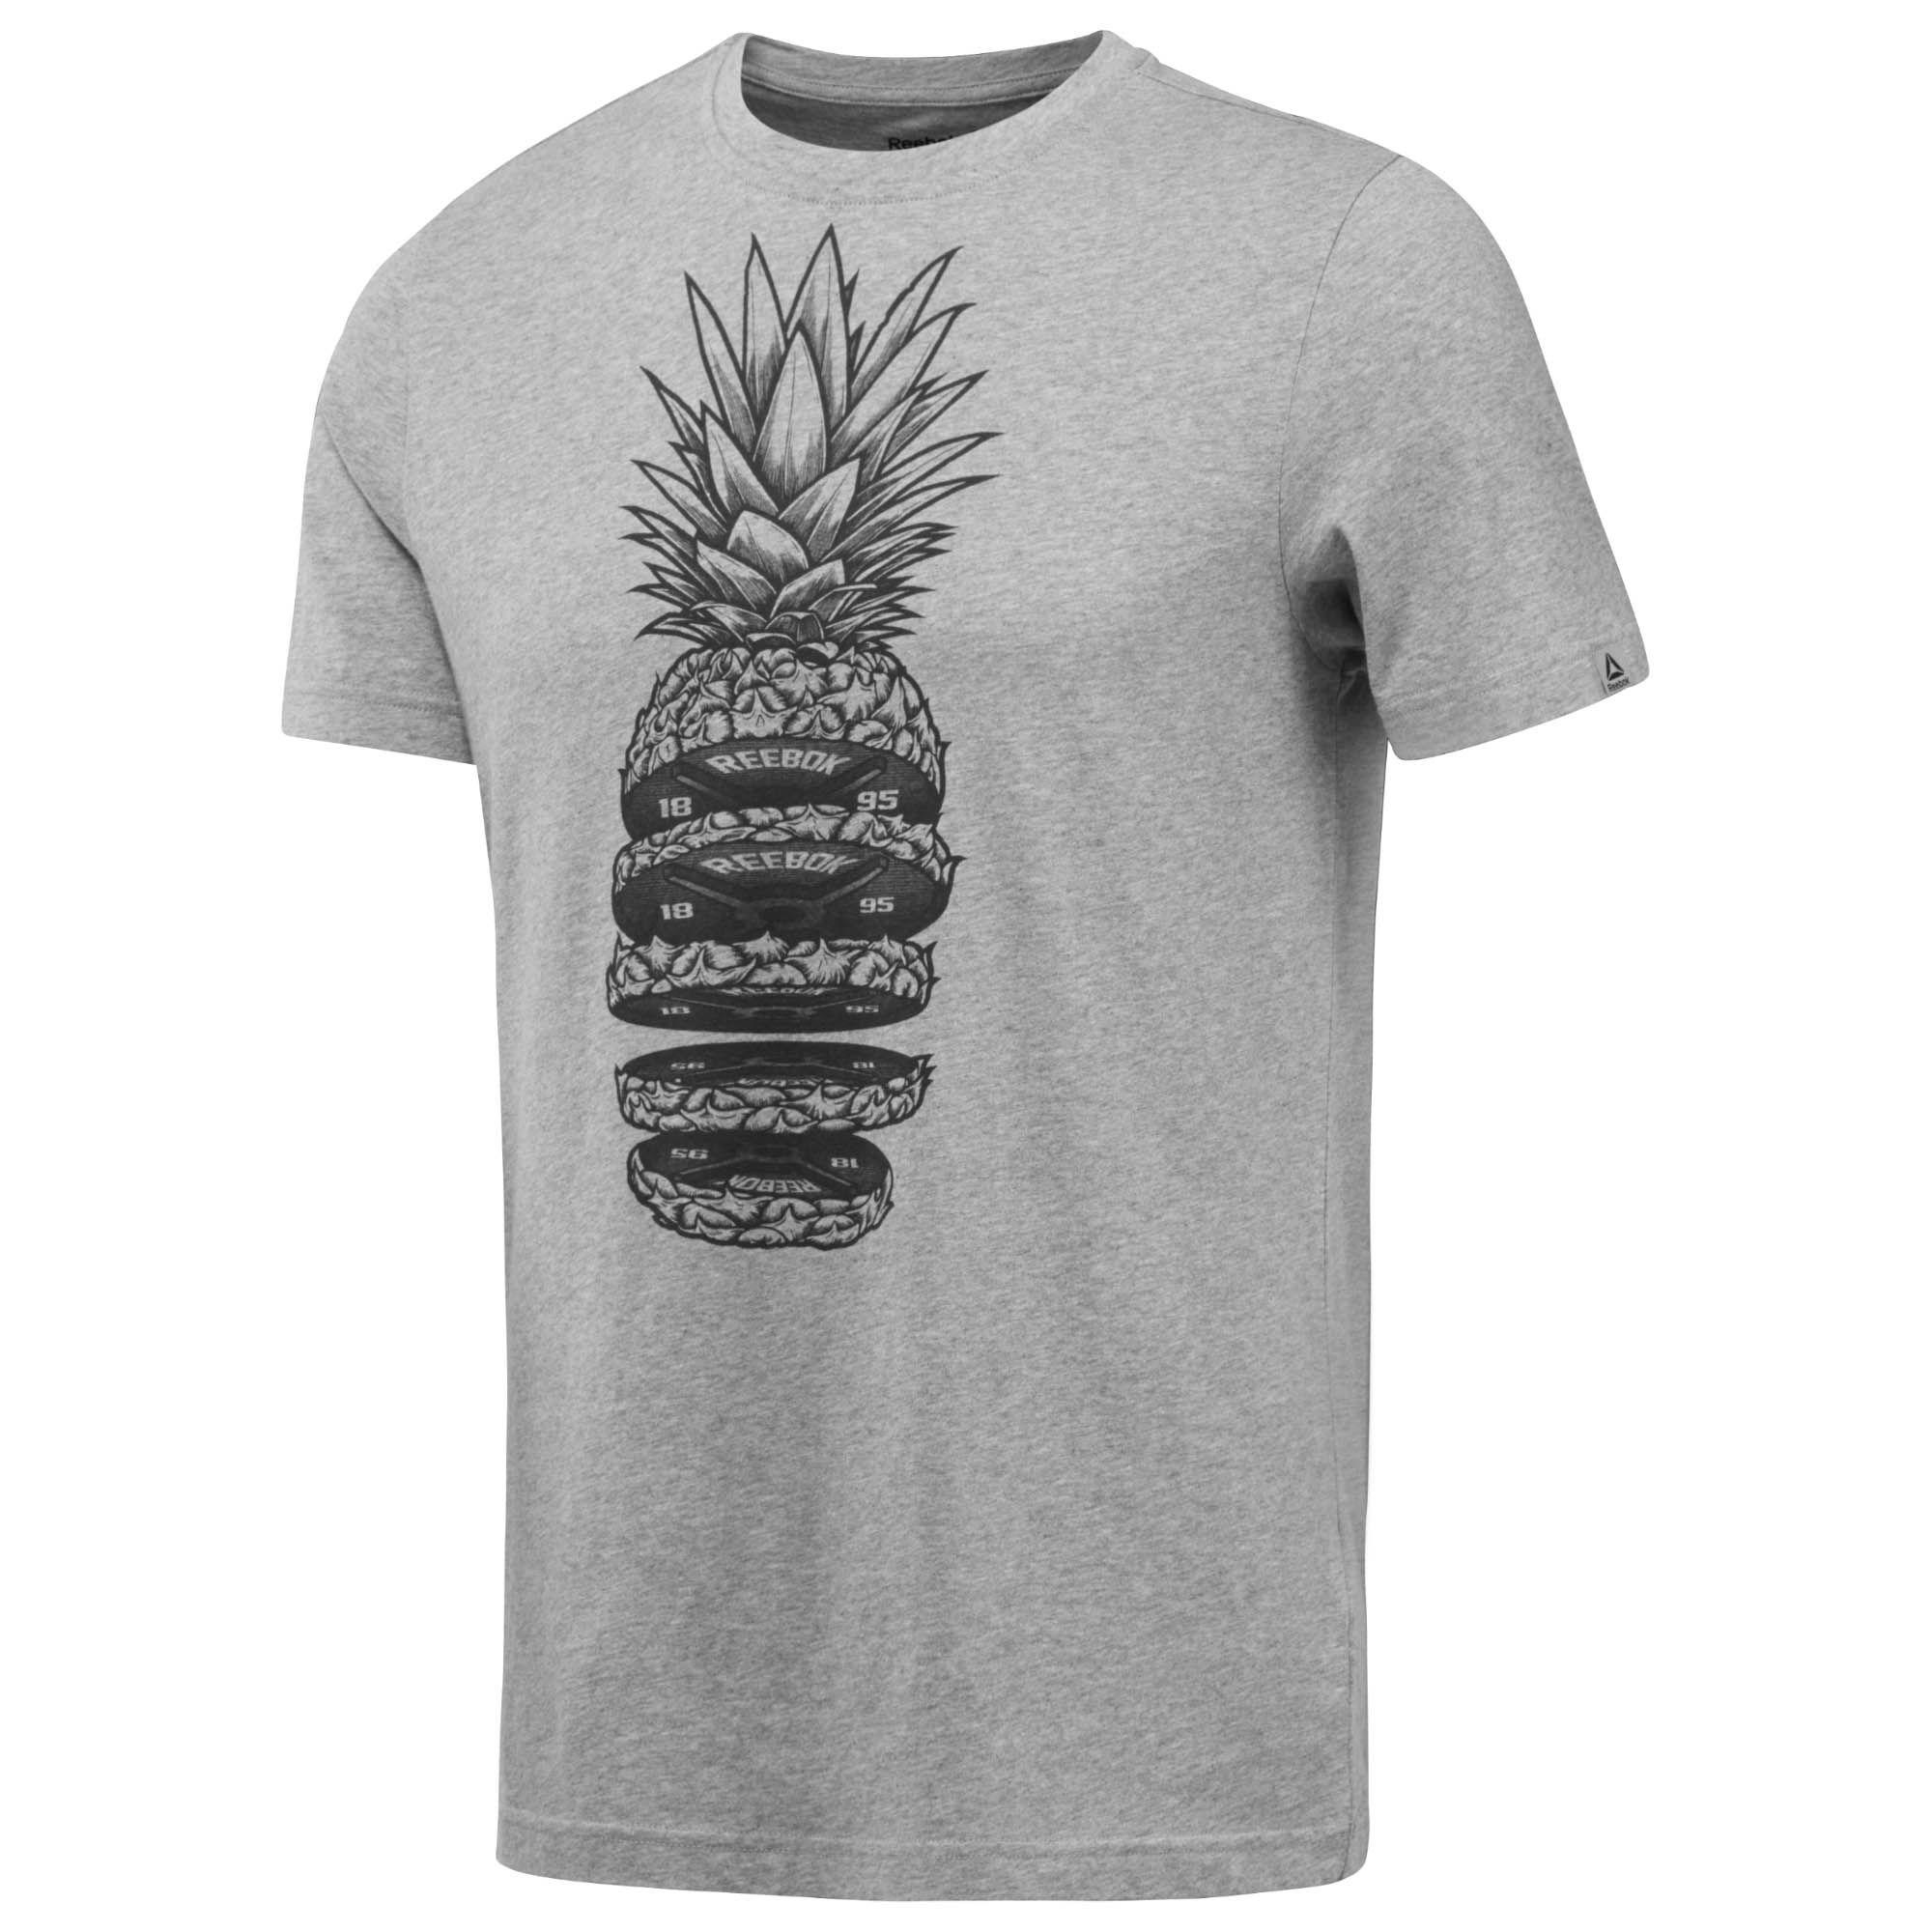 Reebok Pineapple Weights T-Shirt (grey) 2af9a1704